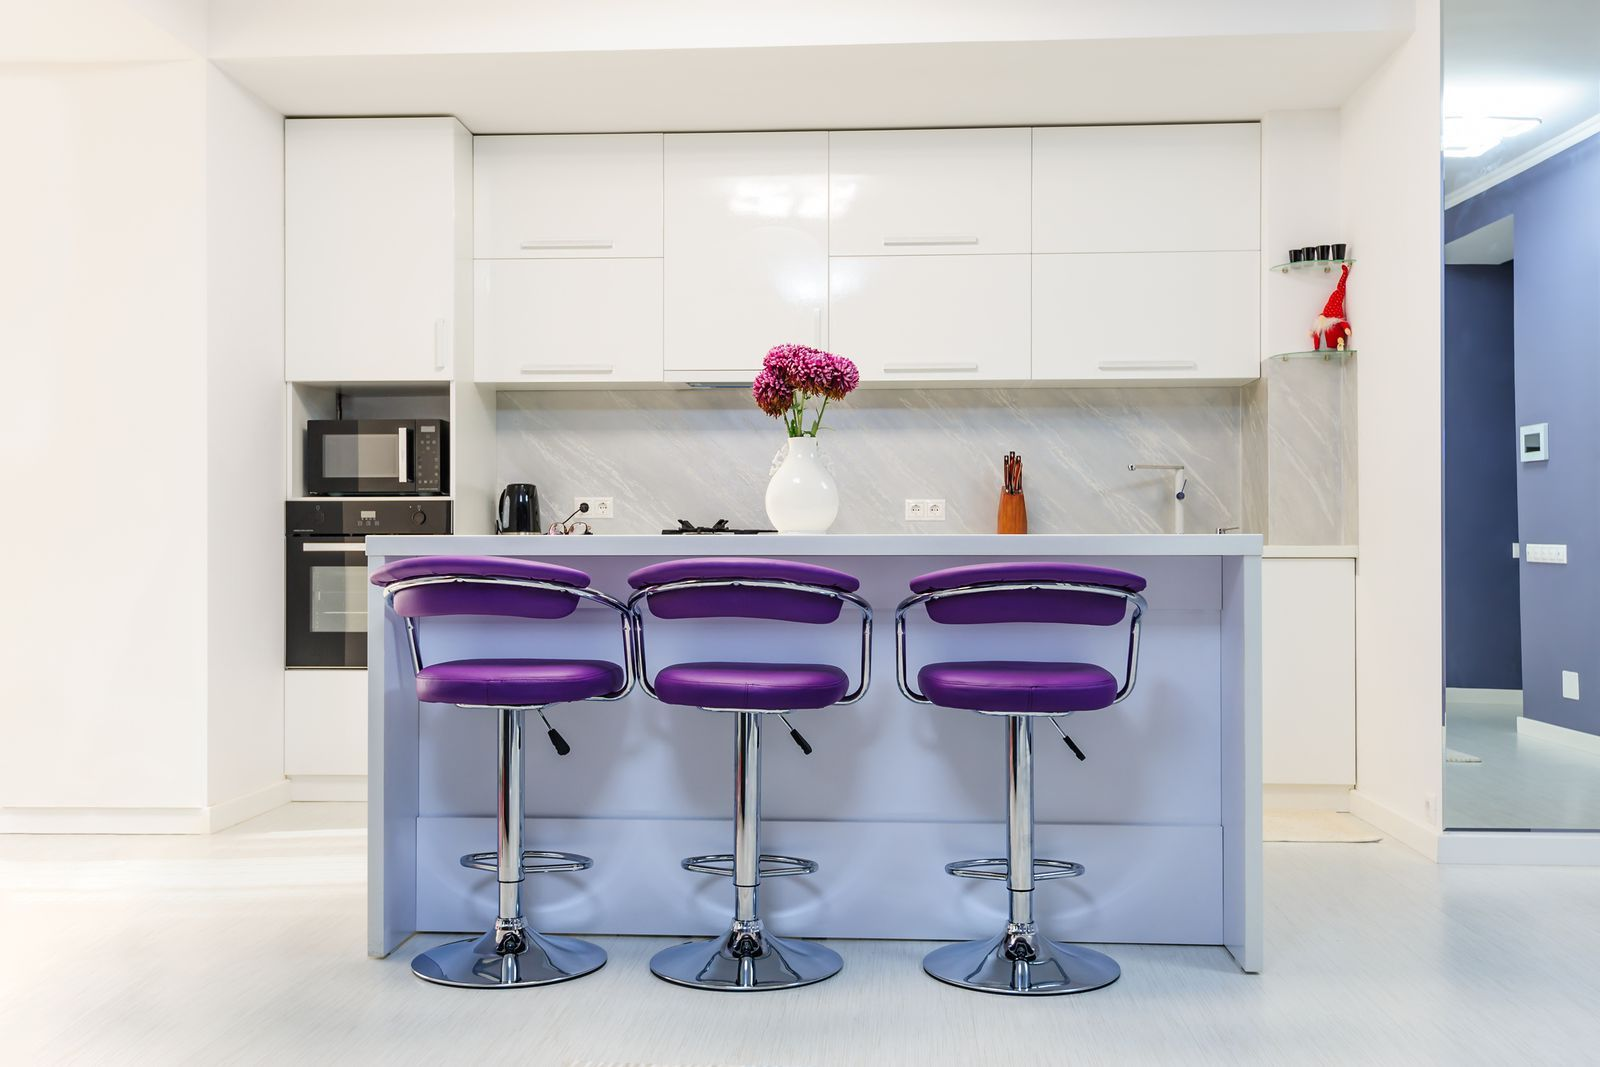 Vibrant Seating Elledecor Purple Love Shades Of Lavender Walls